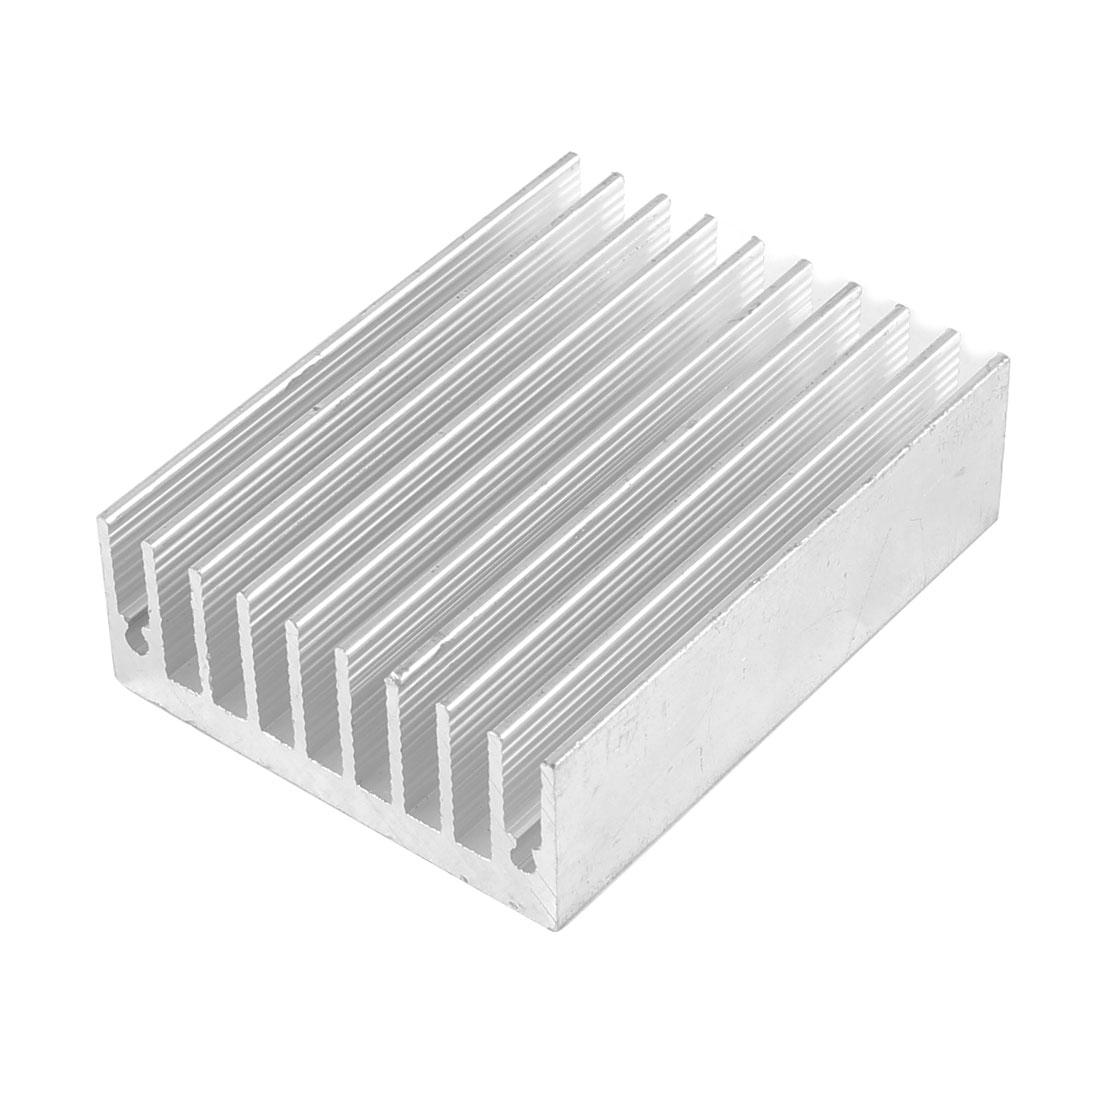 50mm x 45mm x 18mm Aluminium Heat Diffusion Cooling Fin